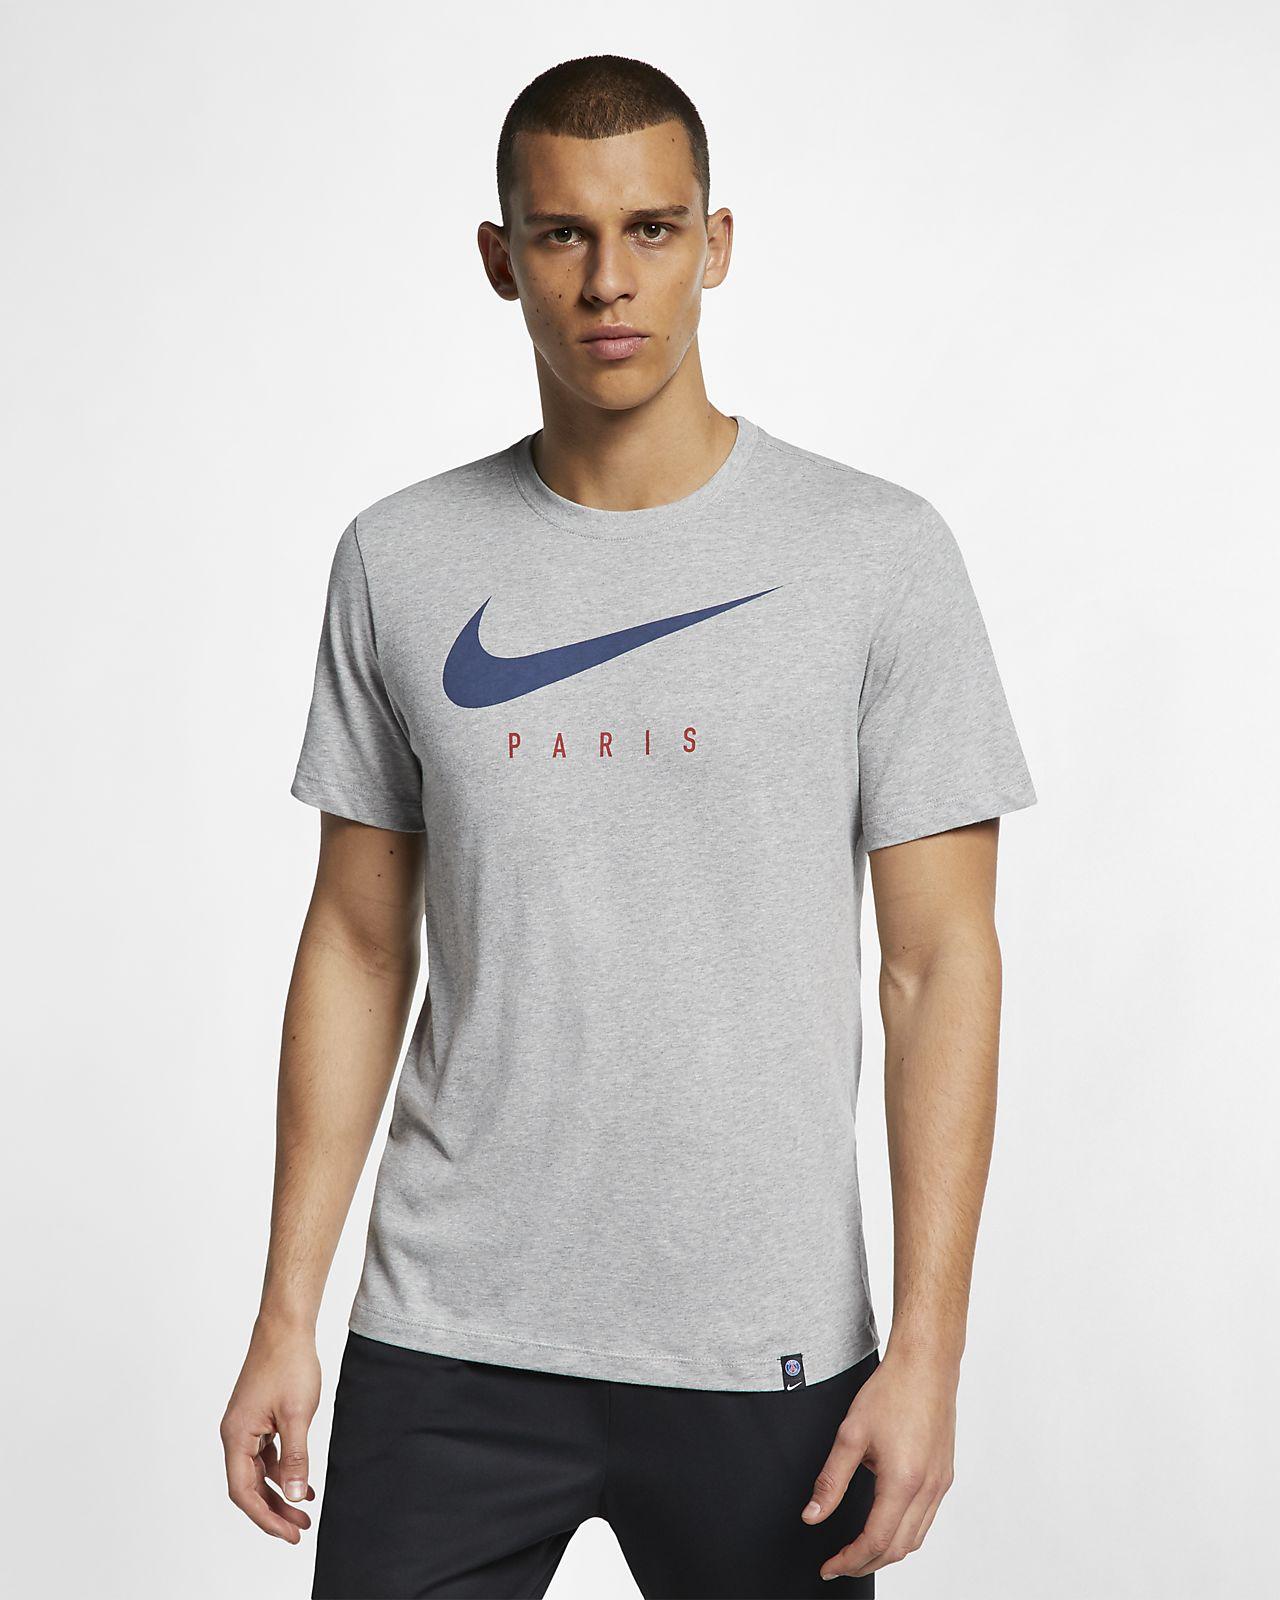 T-shirt da calcio Nike Dri-FIT Paris St-Germain - Uomo